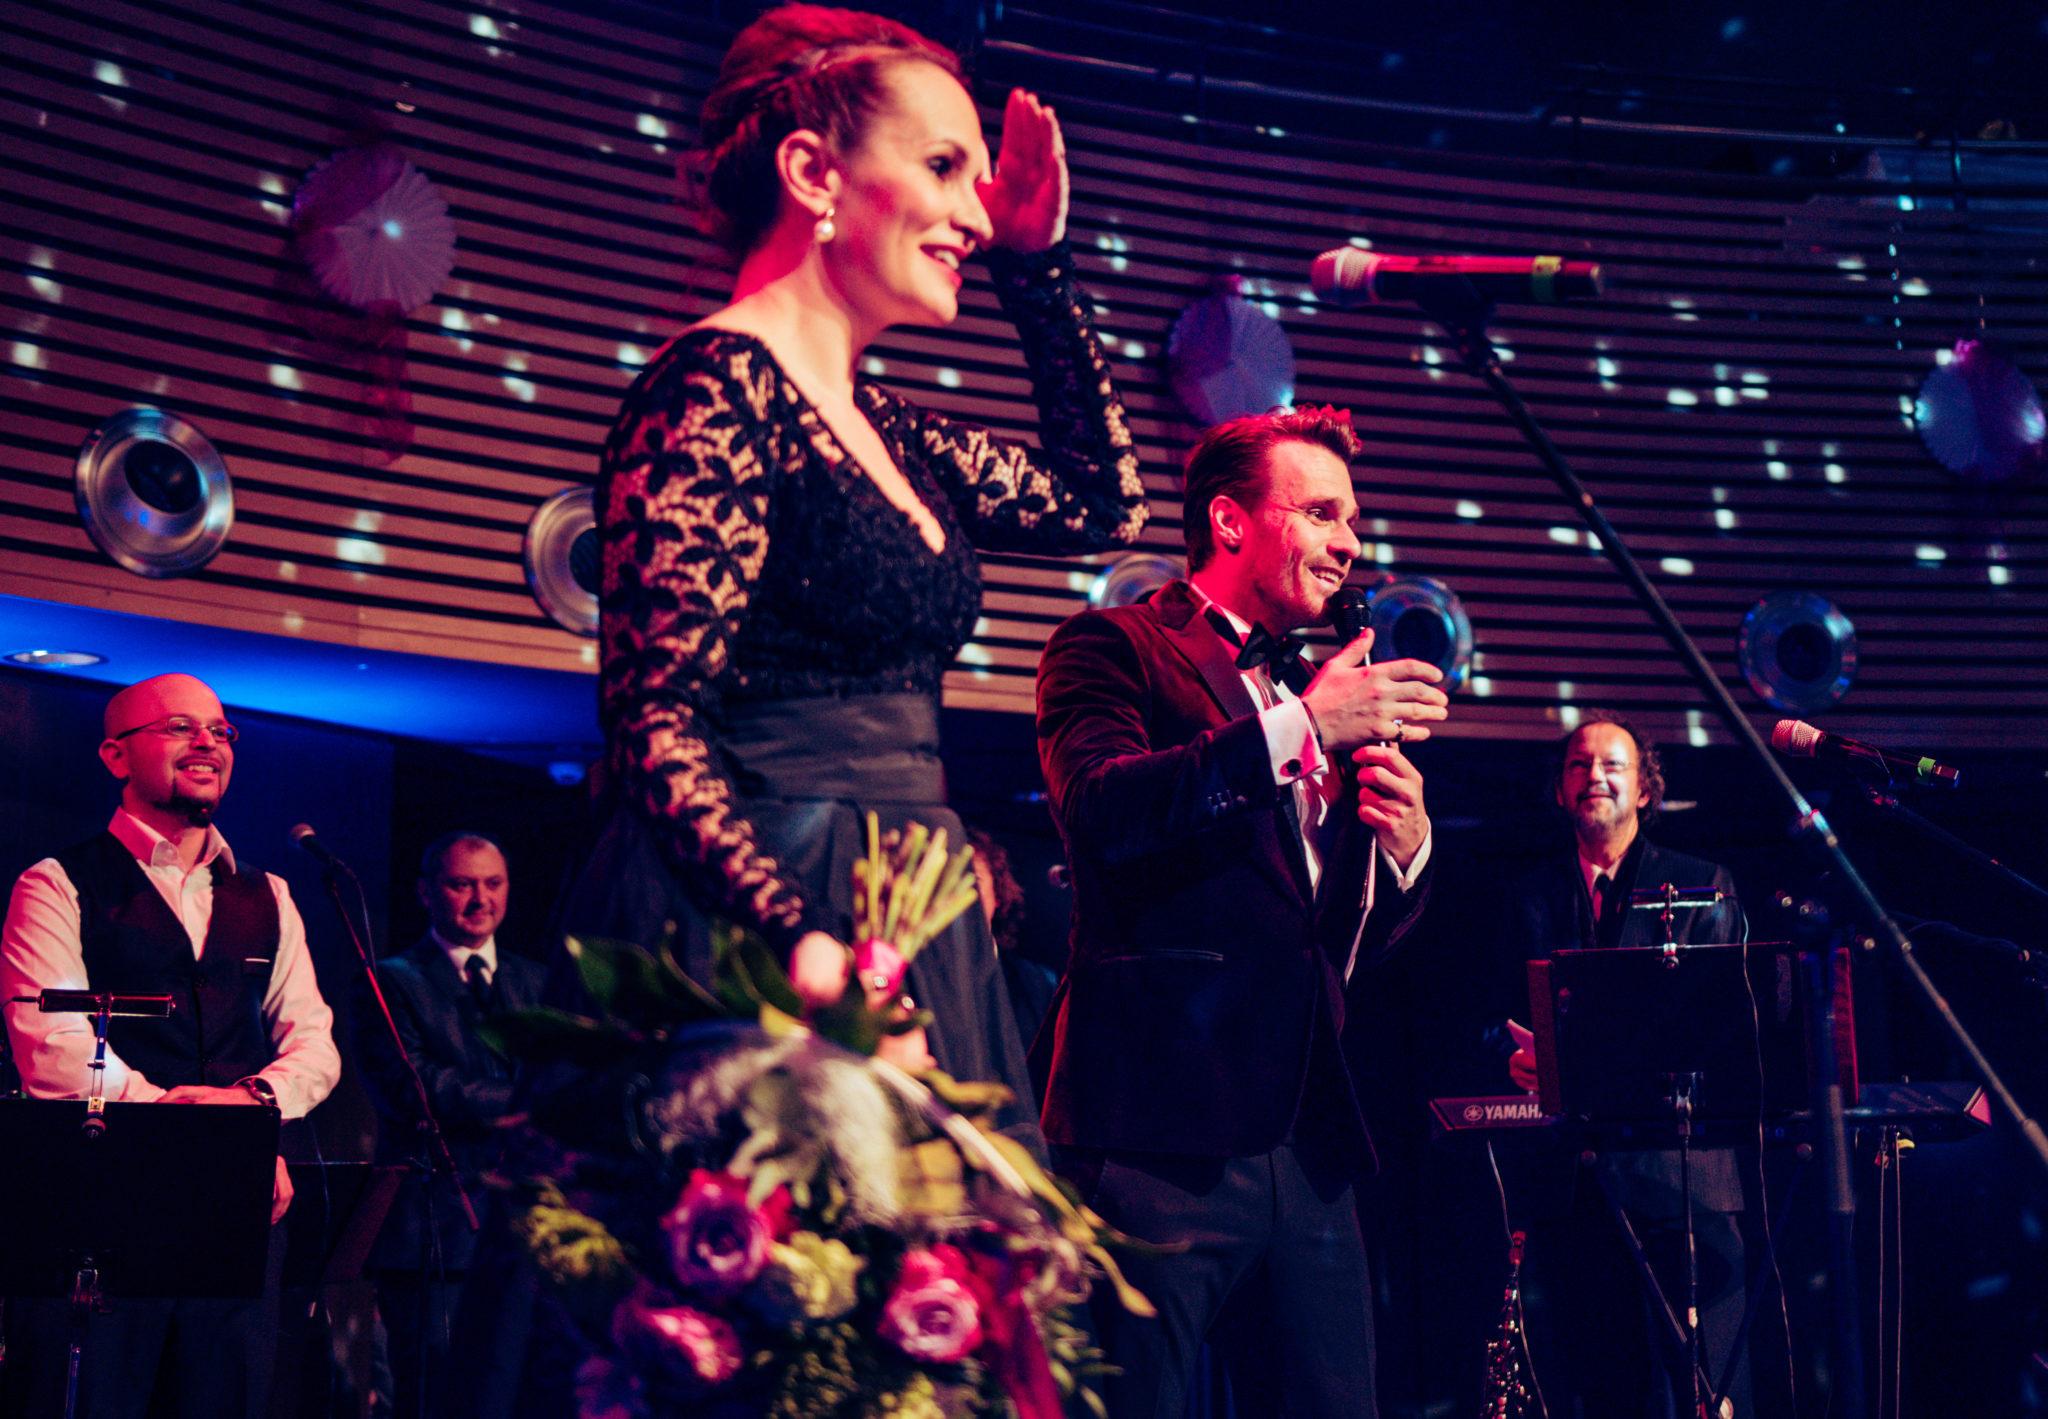 Zpěvačka Monika Absolonová a moderátor Leoš Mareš - Městský ples Trutnov 2018